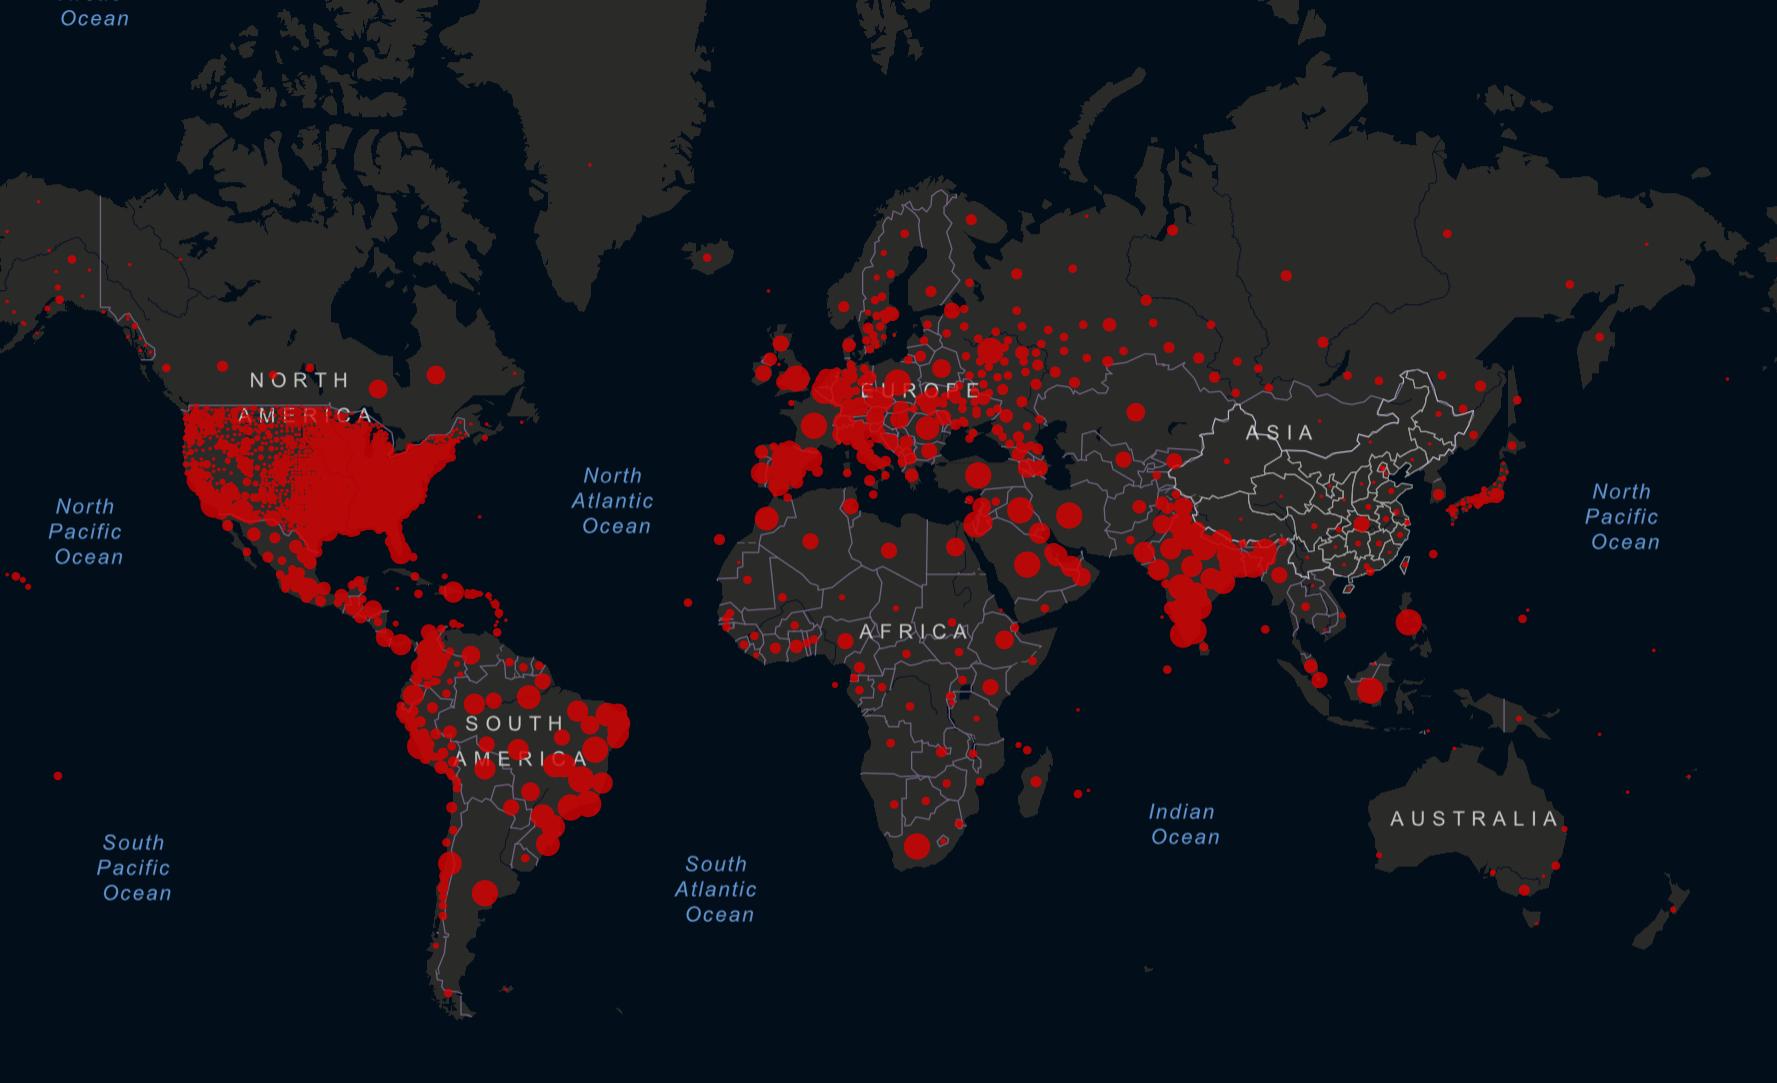 Coronavirus 2019 COVID-19 Outbreak Map